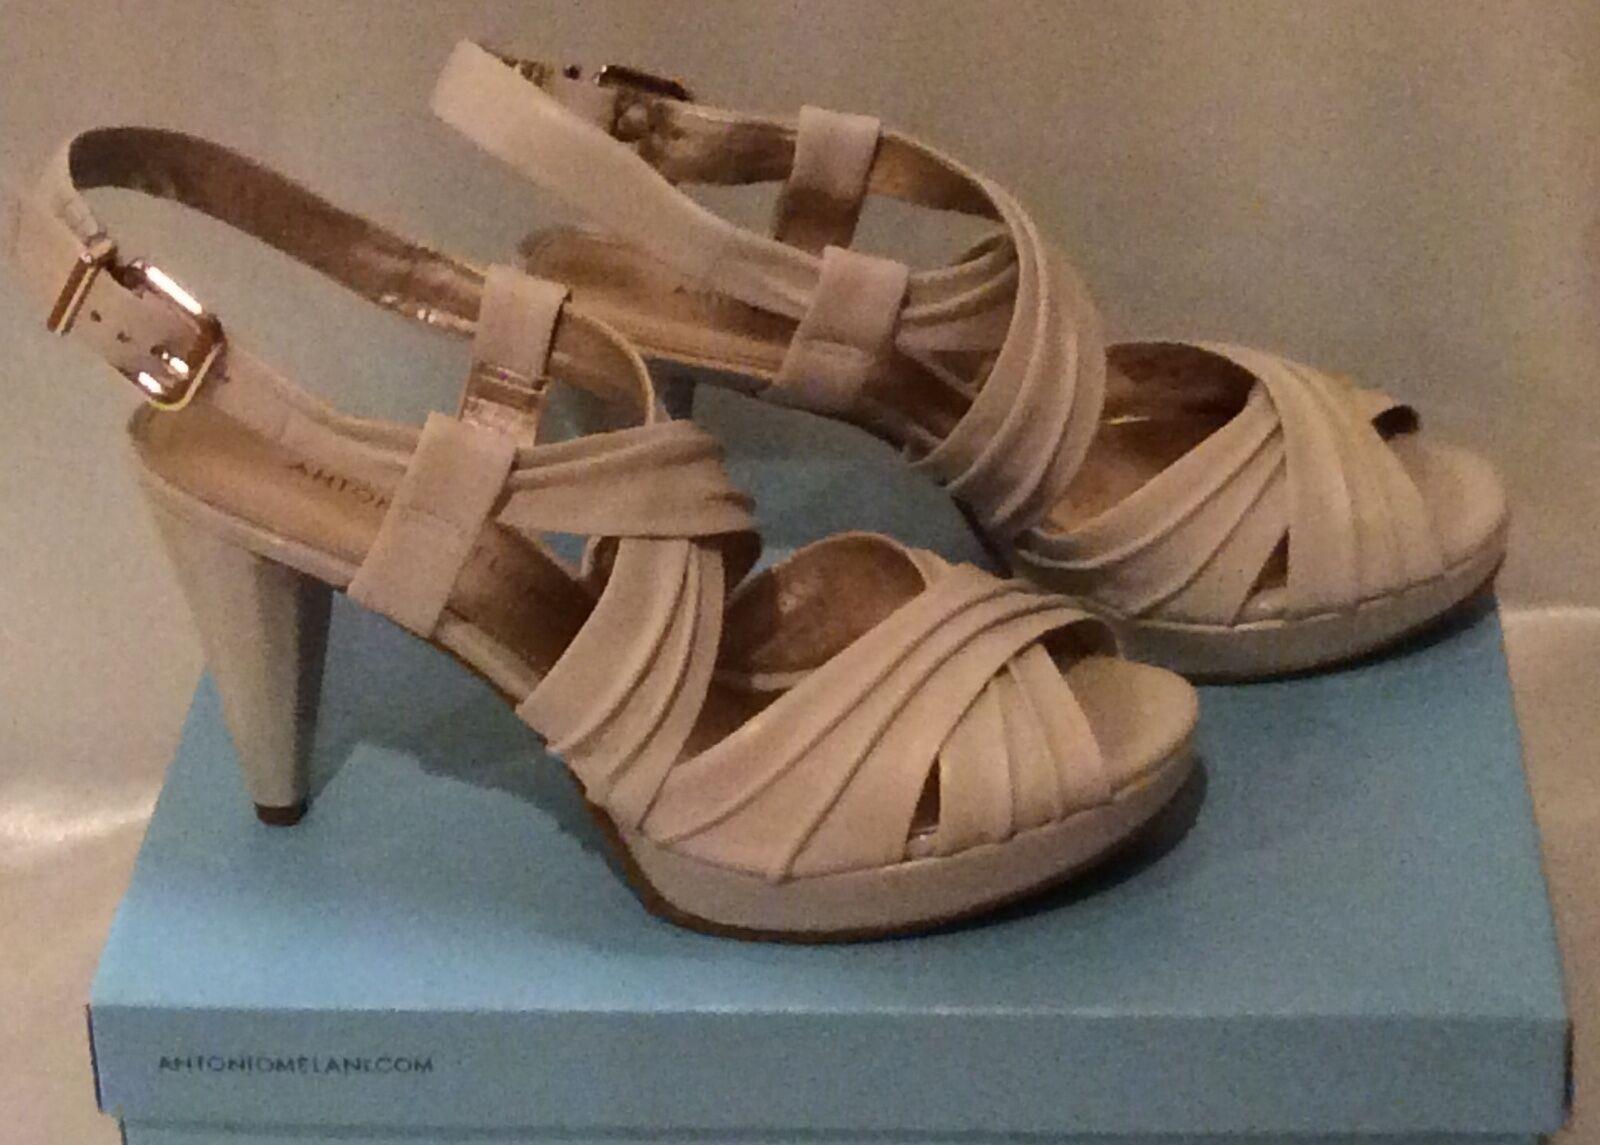 Antonio Melani, Holden Sandals chaussures, Beige   Rice  3.5  heel 7.5 M, New in Box